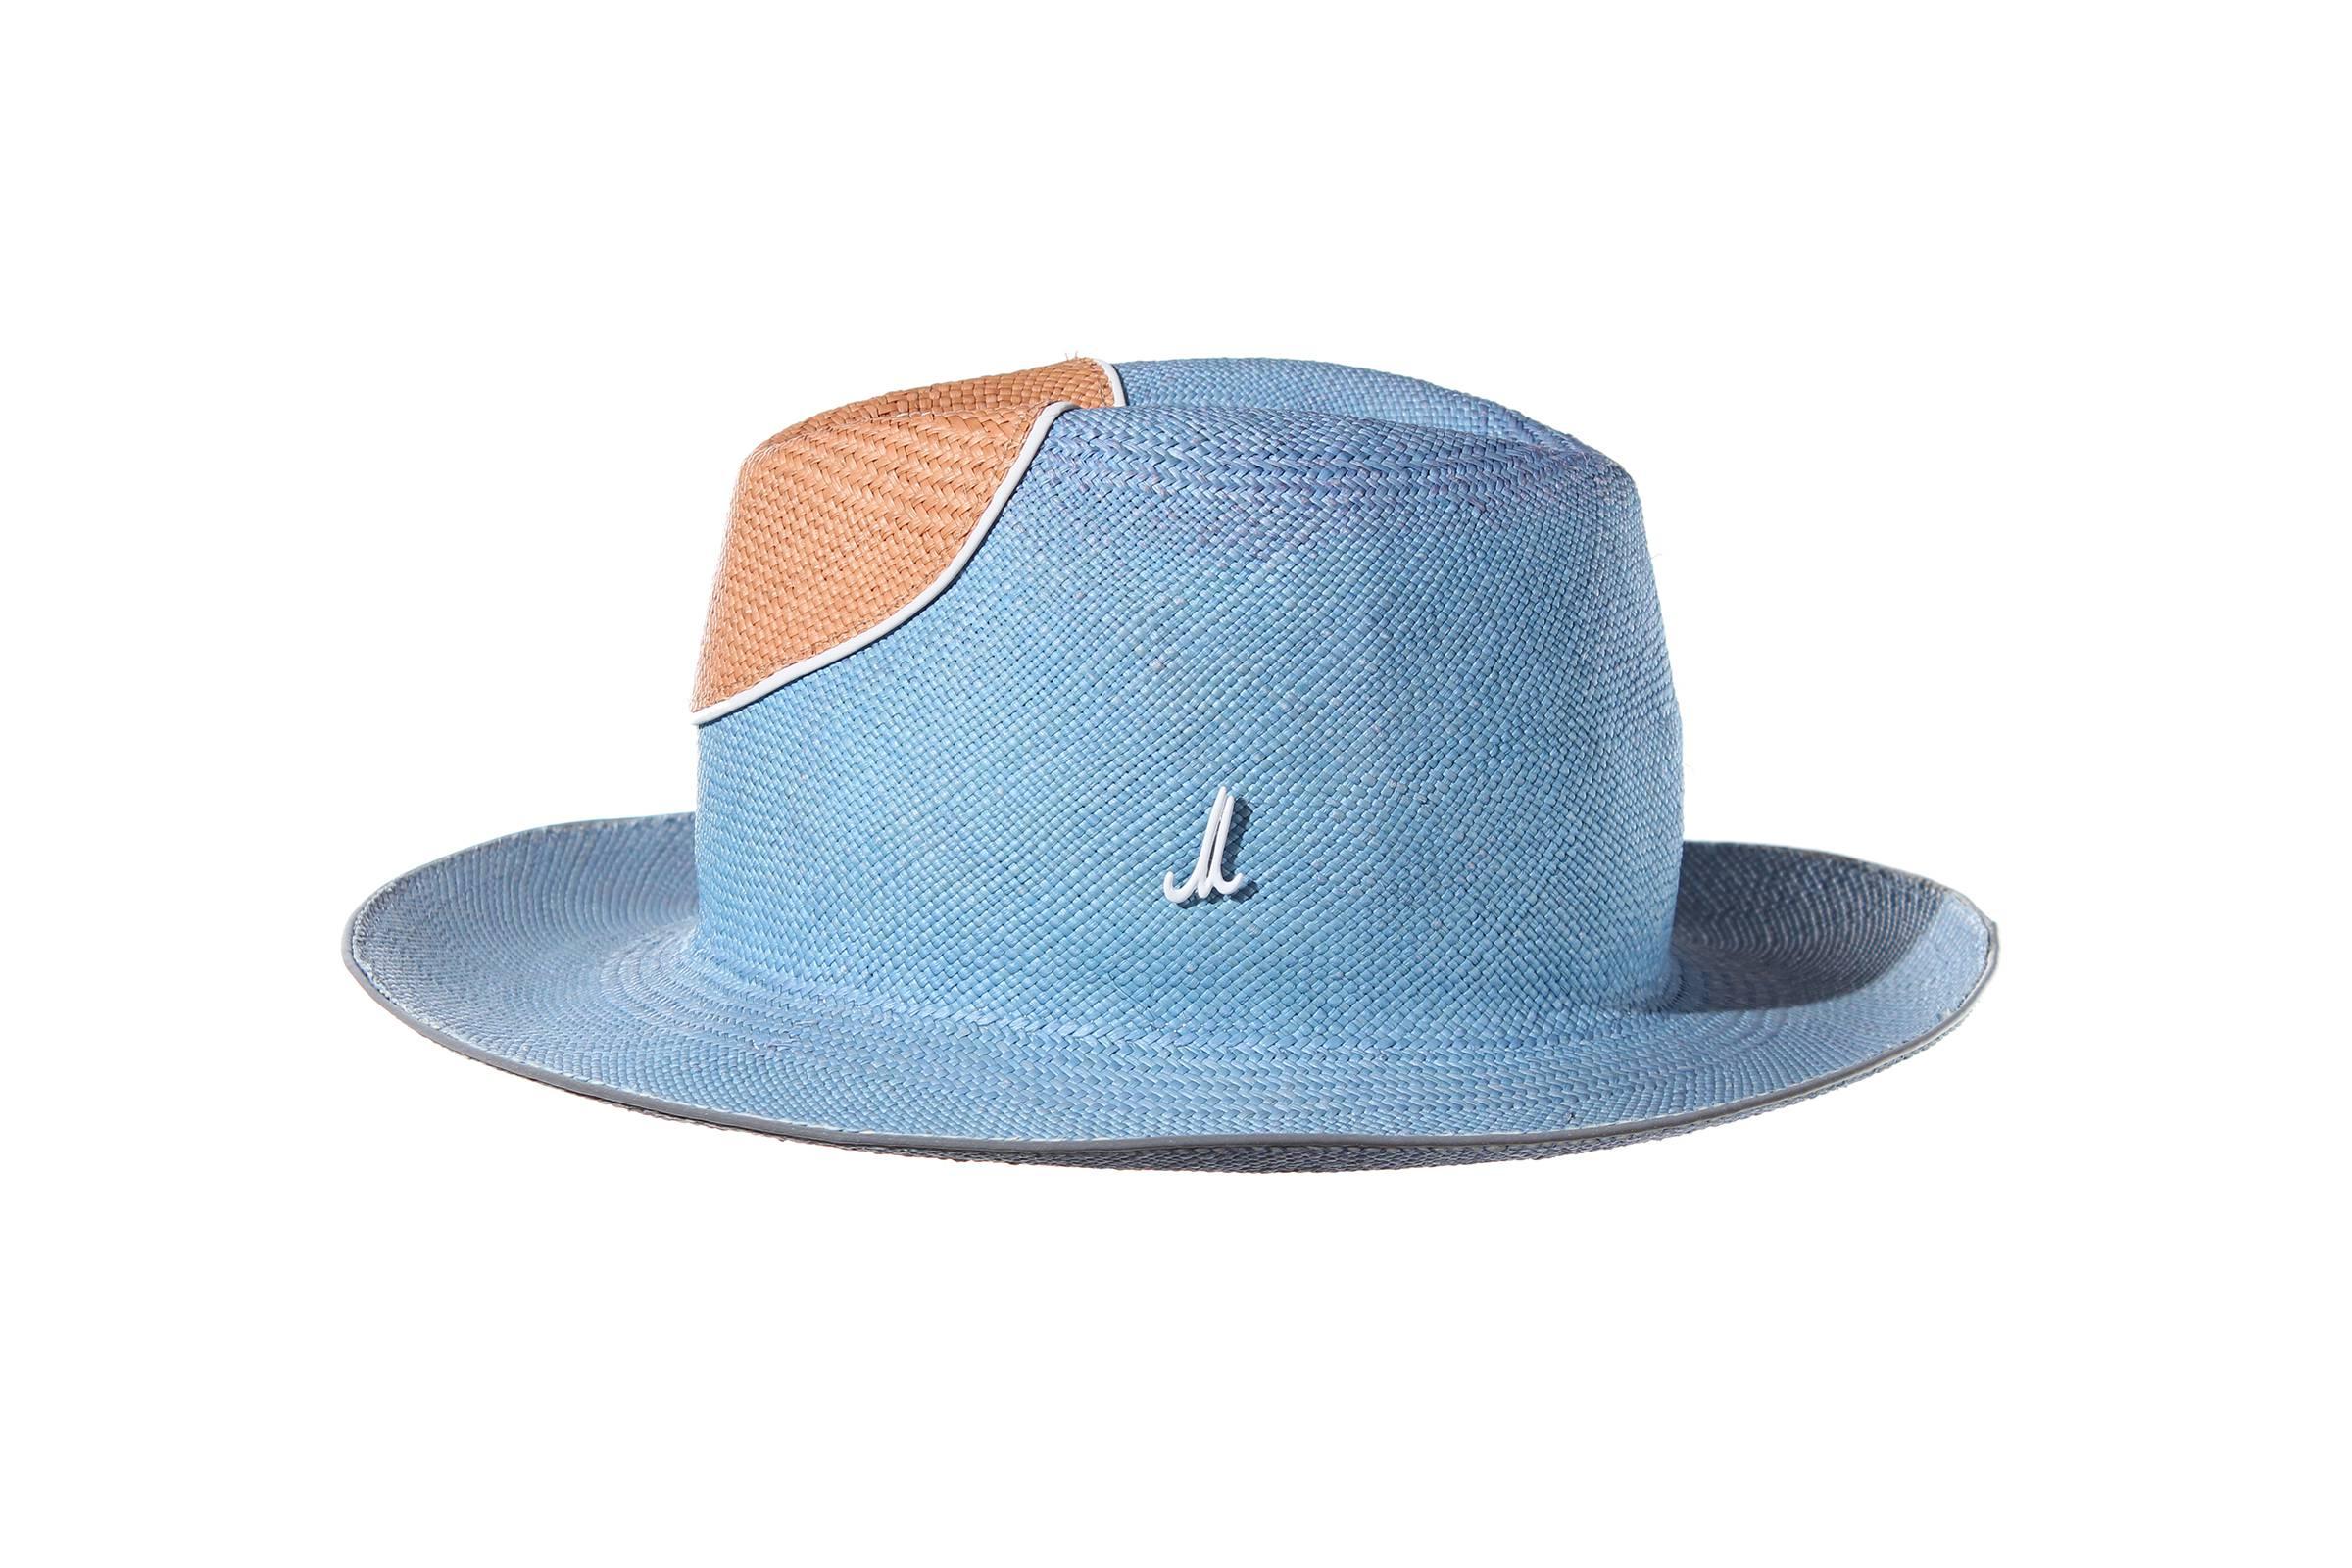 gentleman's hat ART UDO panama straw / panama straw nose